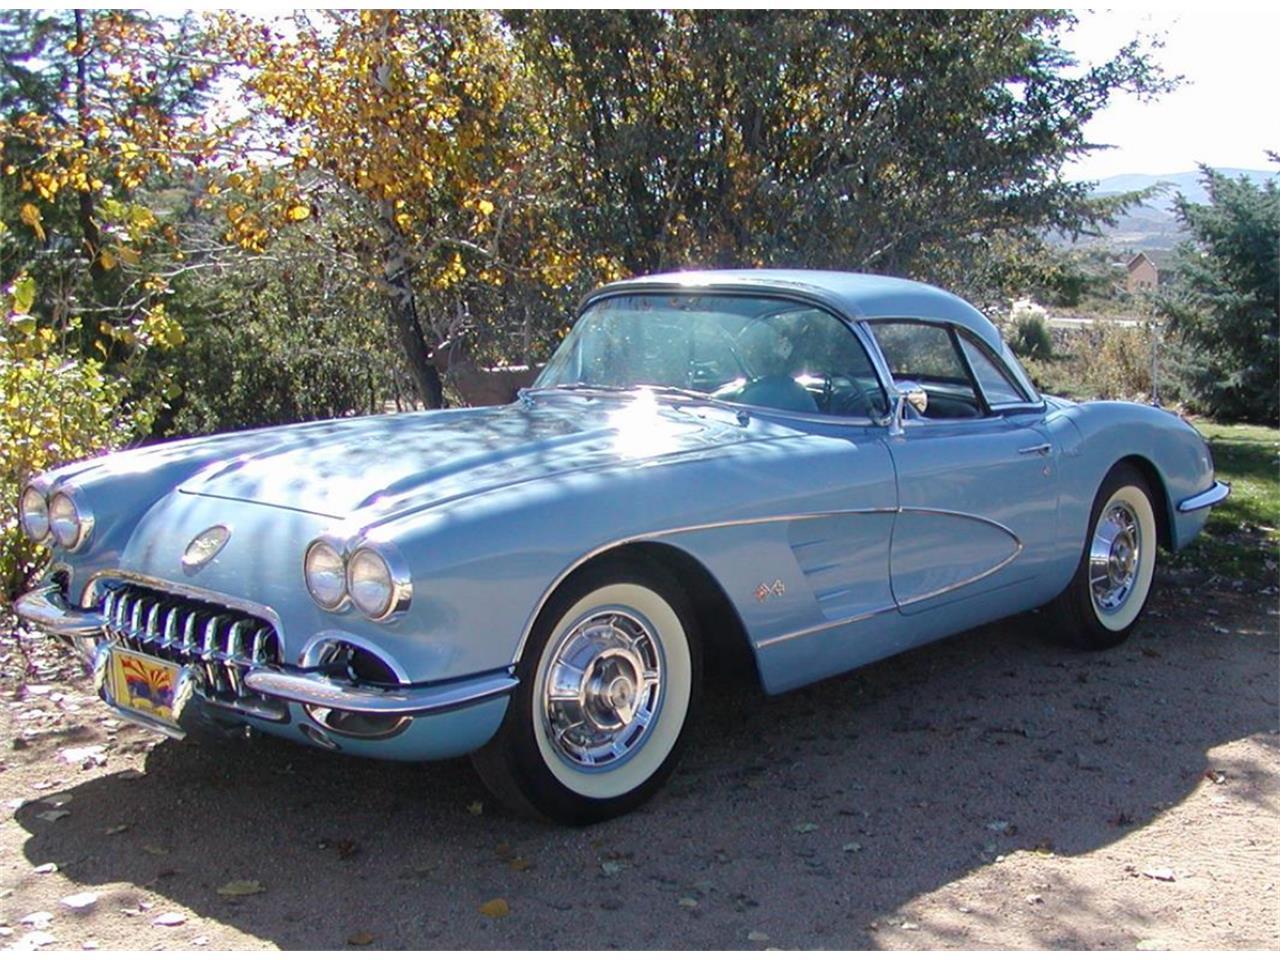 100+ 1960 Corvette For Sale Craigslist – yasminroohi